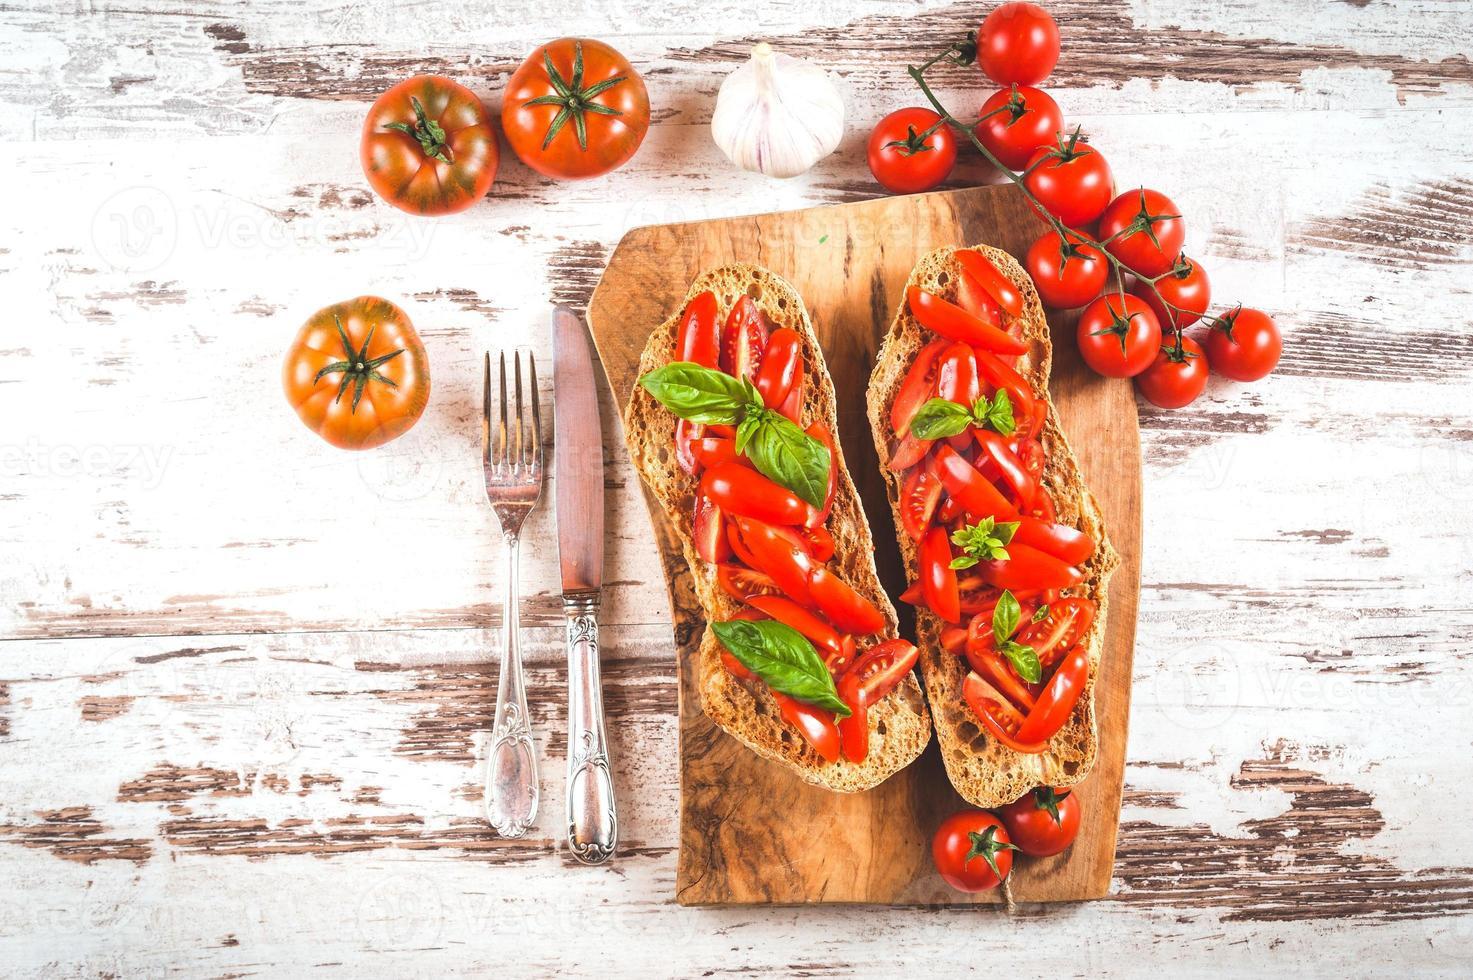 Italian starter, bruschetta with Sicilian red fresh tomato on a photo